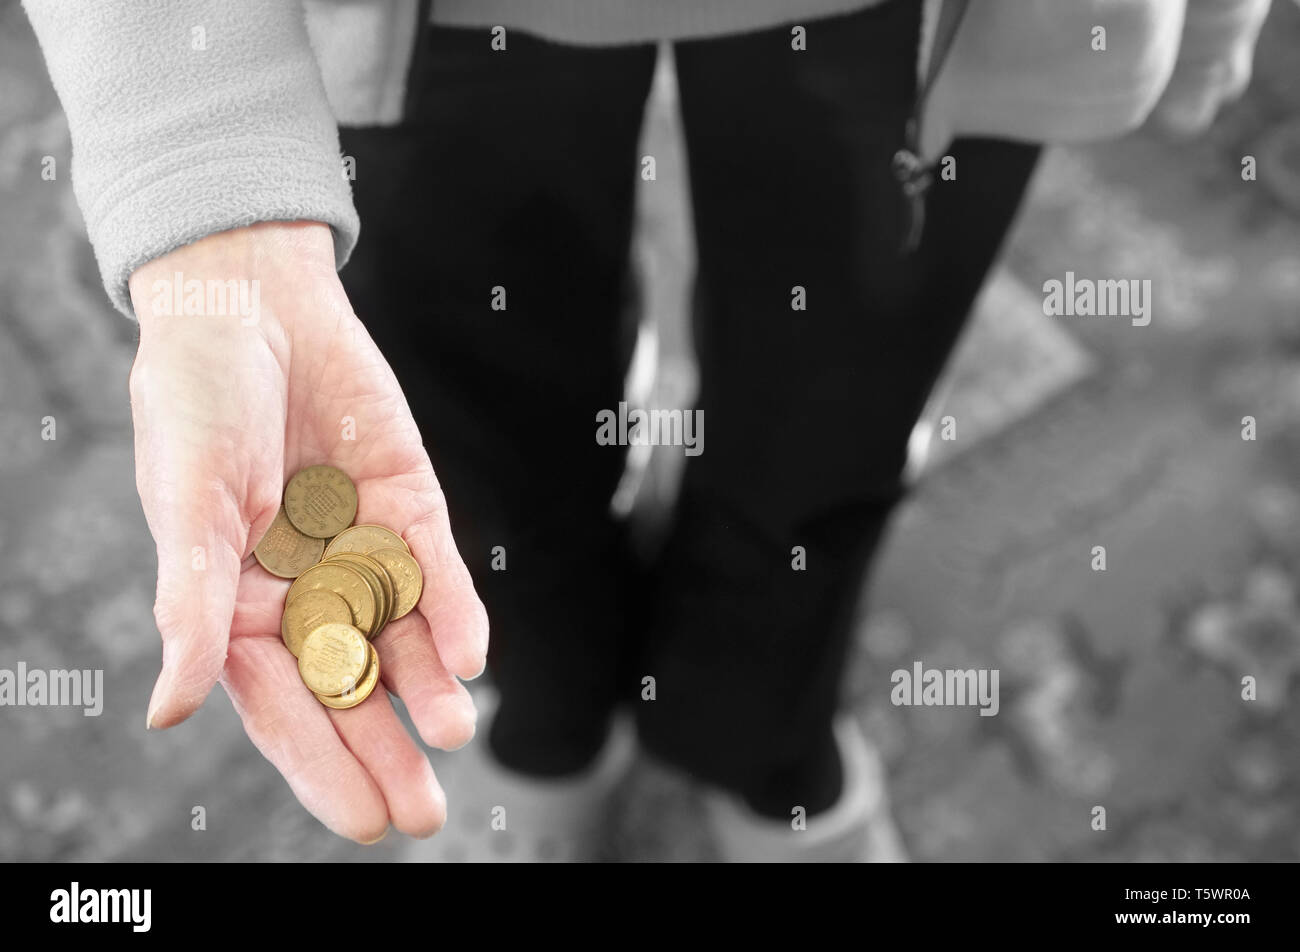 Poor society elderly hand of senior person full of worthless bronze coins - Stock Image